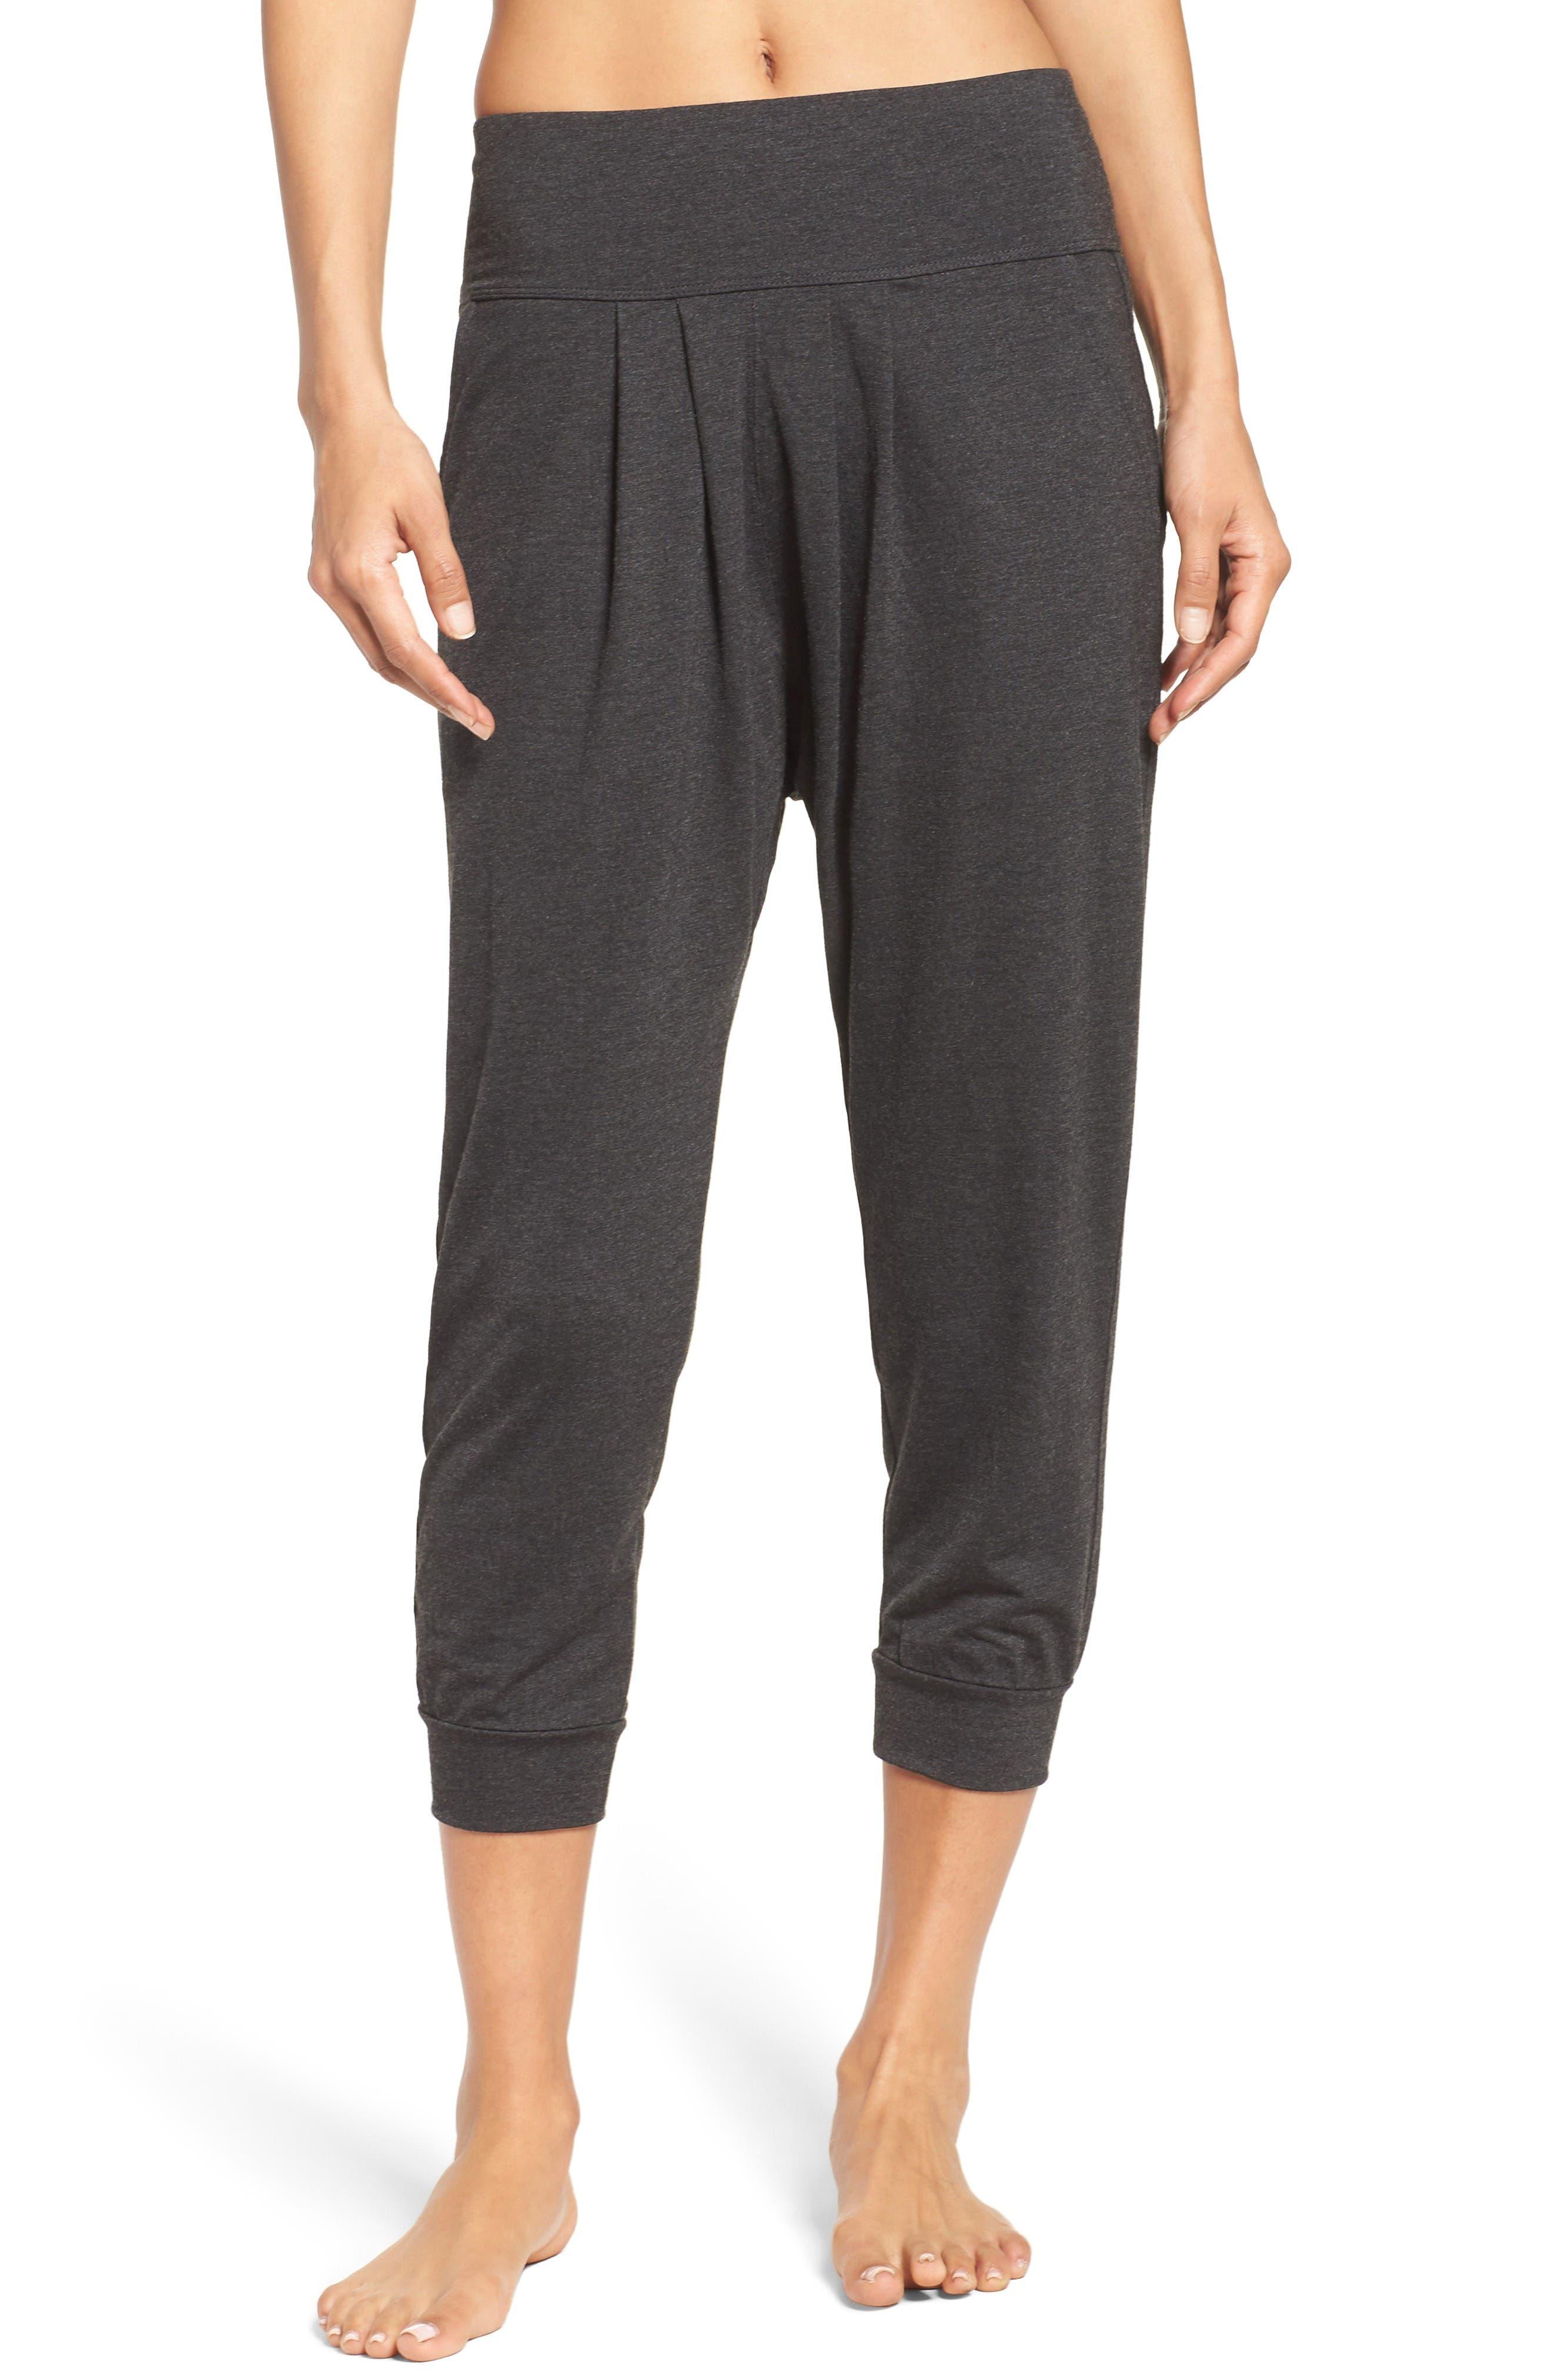 Harmony Crop Harem Pants,                             Main thumbnail 1, color,                             Grey Dark Charcoal Heather